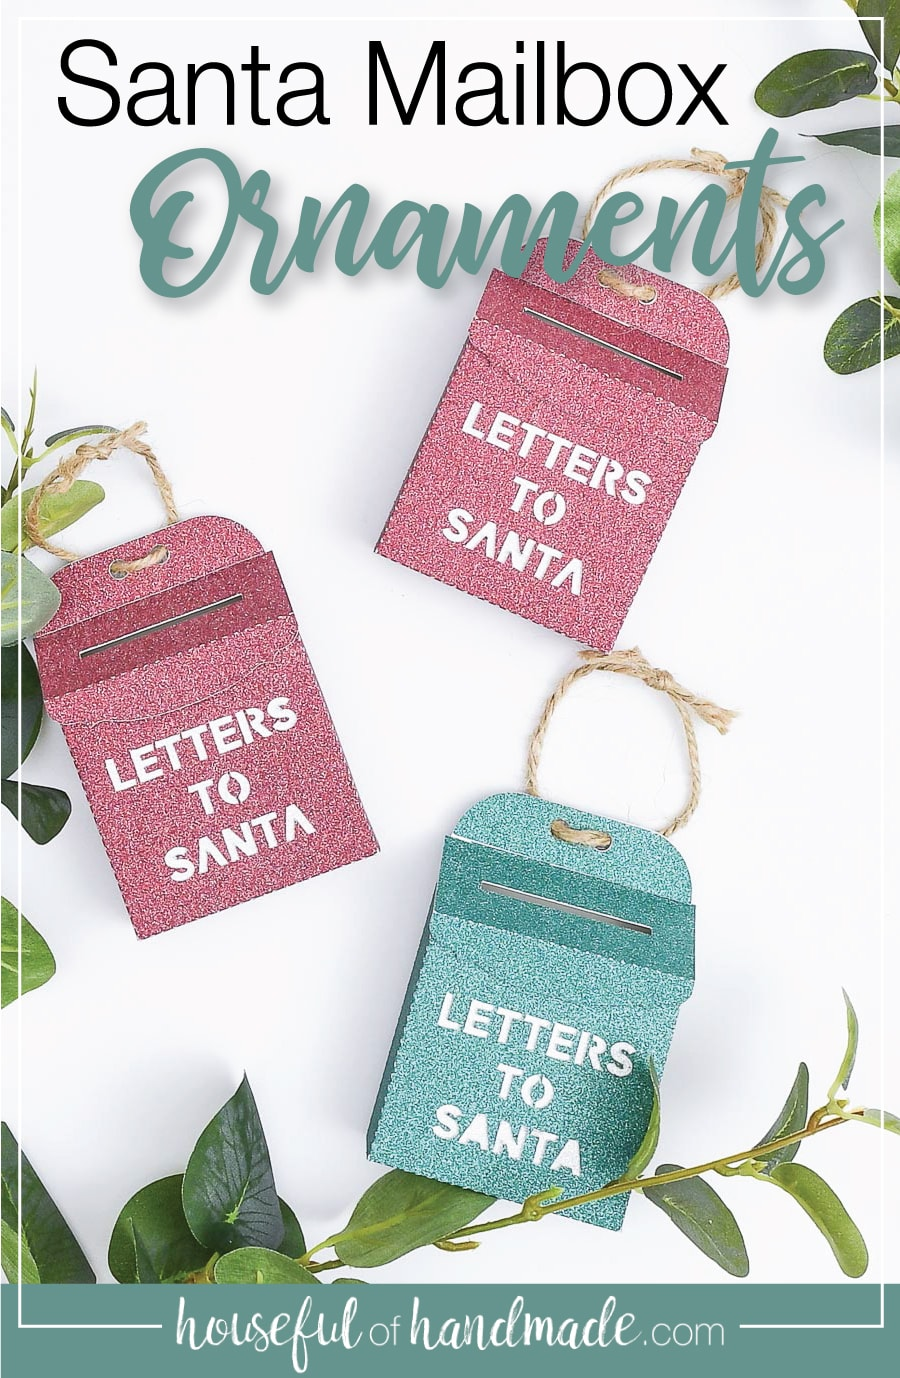 Mini Santa Mailbox Christmas ornaments on a white table with greenery and text overlay: Santa Mailbox Ornaments.